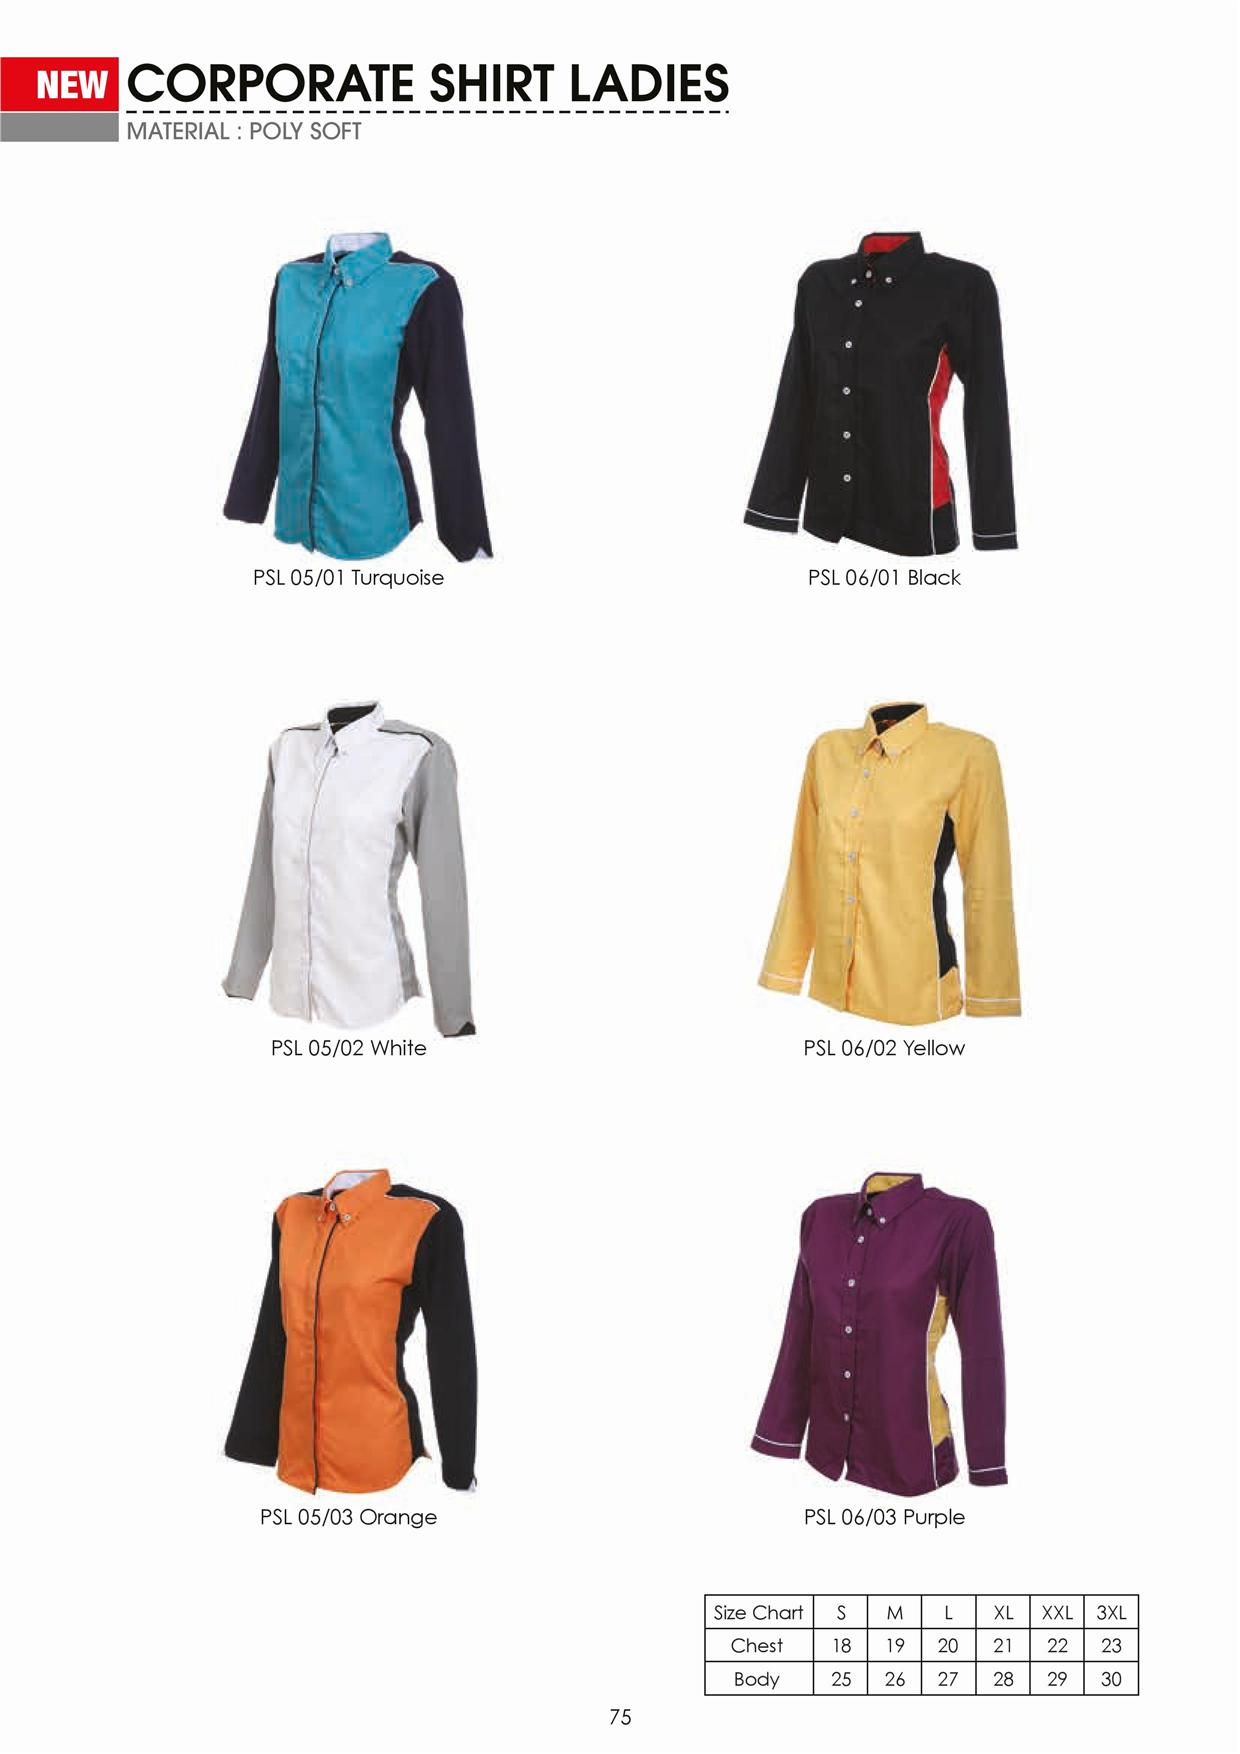 Woman Corporate Shirt Uniform Wanita (end 2/25/2017 3:15 PM)